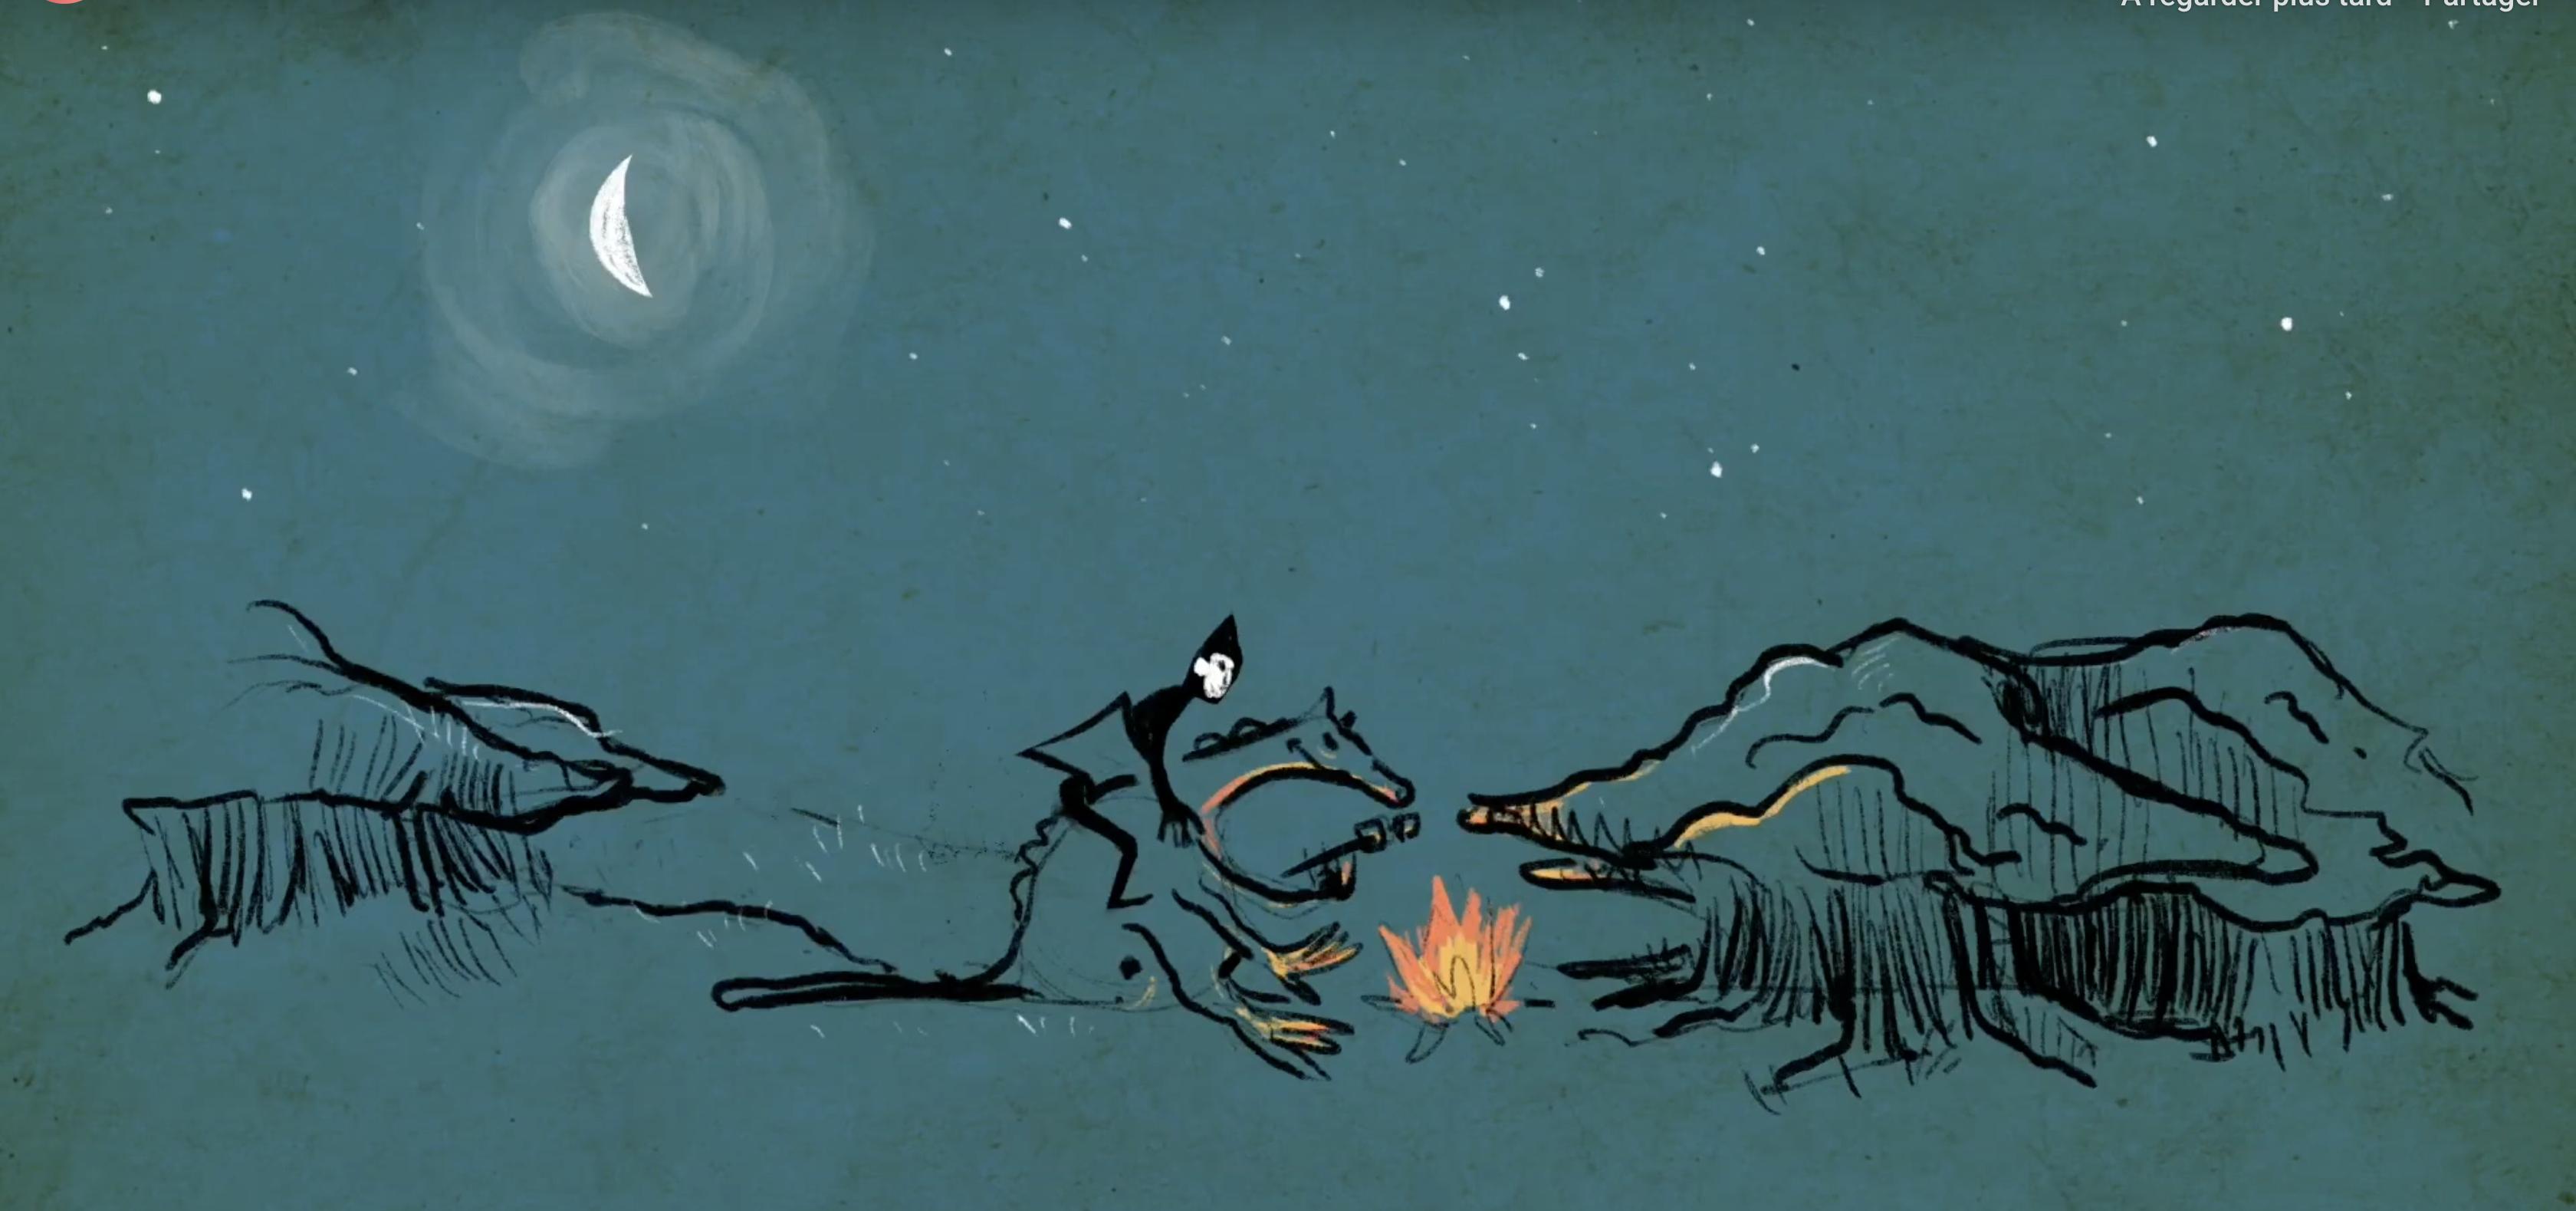 Animation traditionnelle : Balthazar